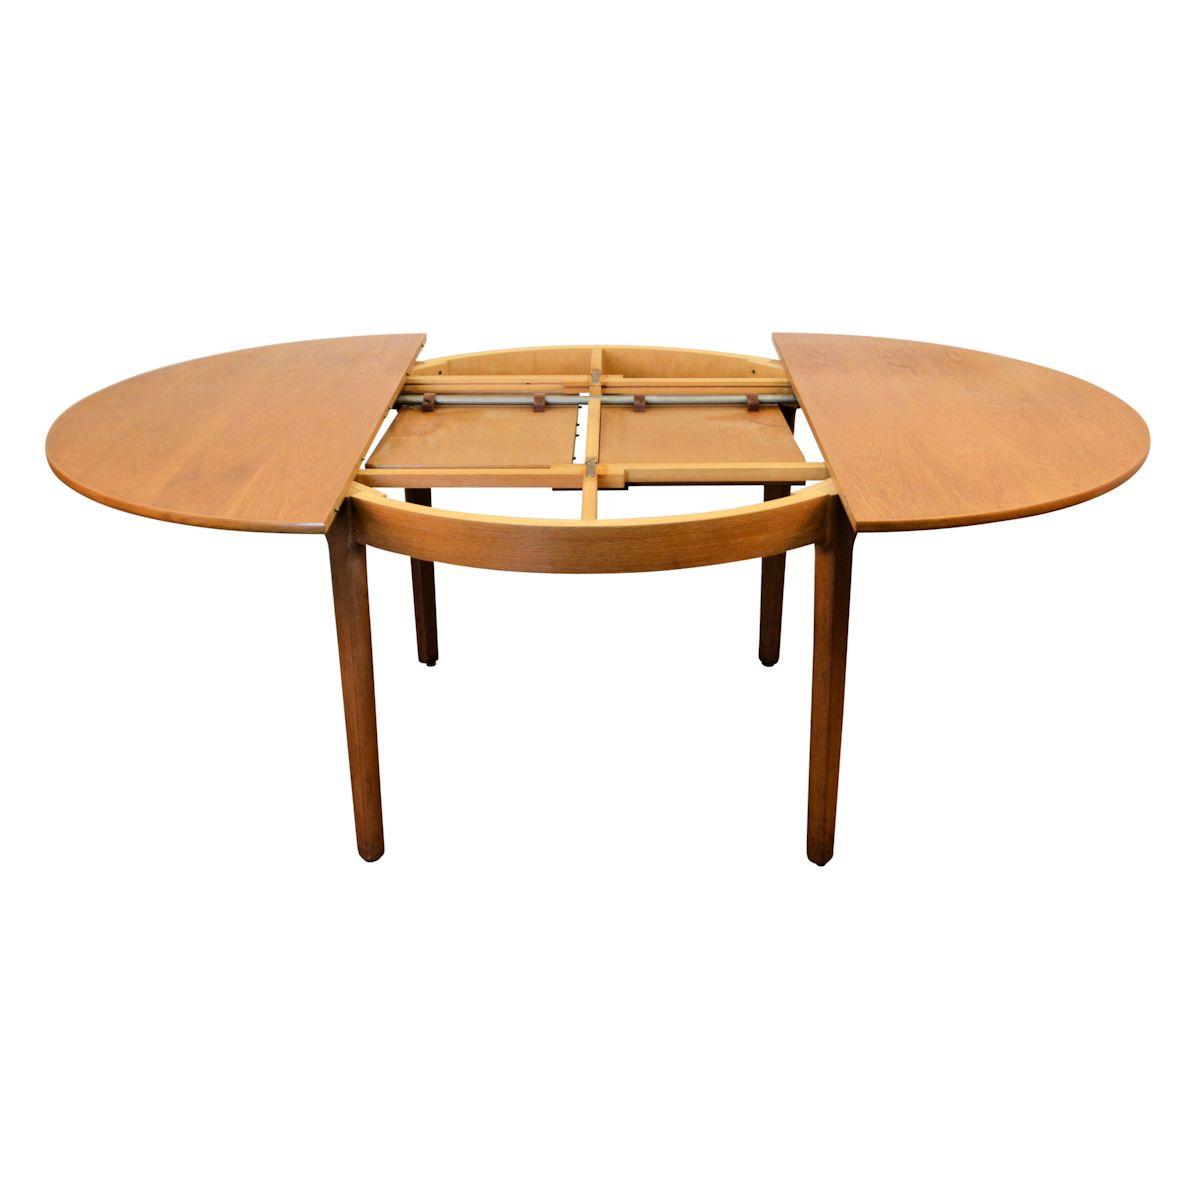 Ronde Verlengbare Eettafel.Vintage Deens Design Verlengbare Eiken Eettafel